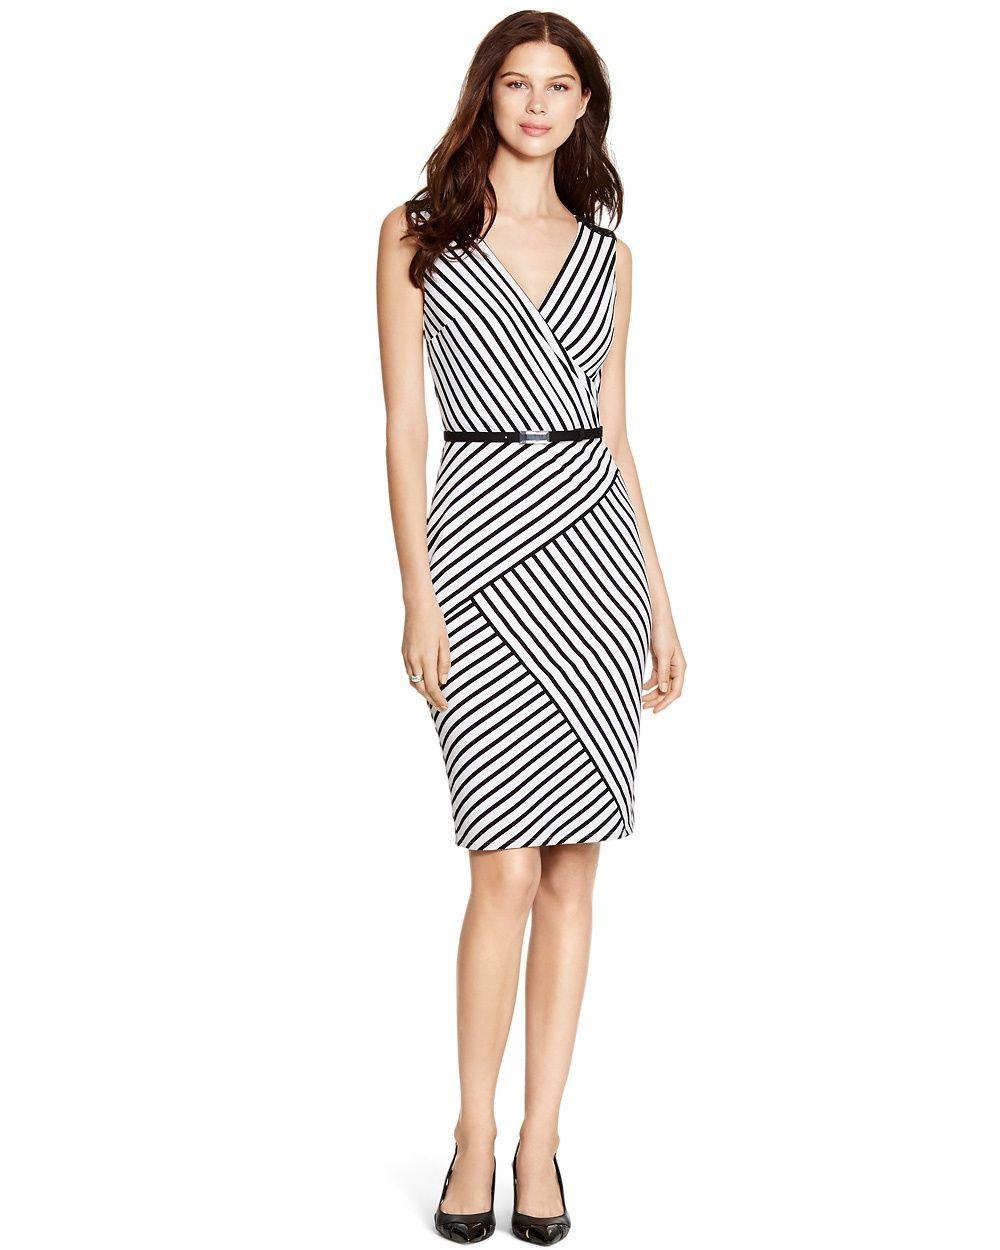 Shop Up to 60% off Dresses - Dress Sale  2169eefbb